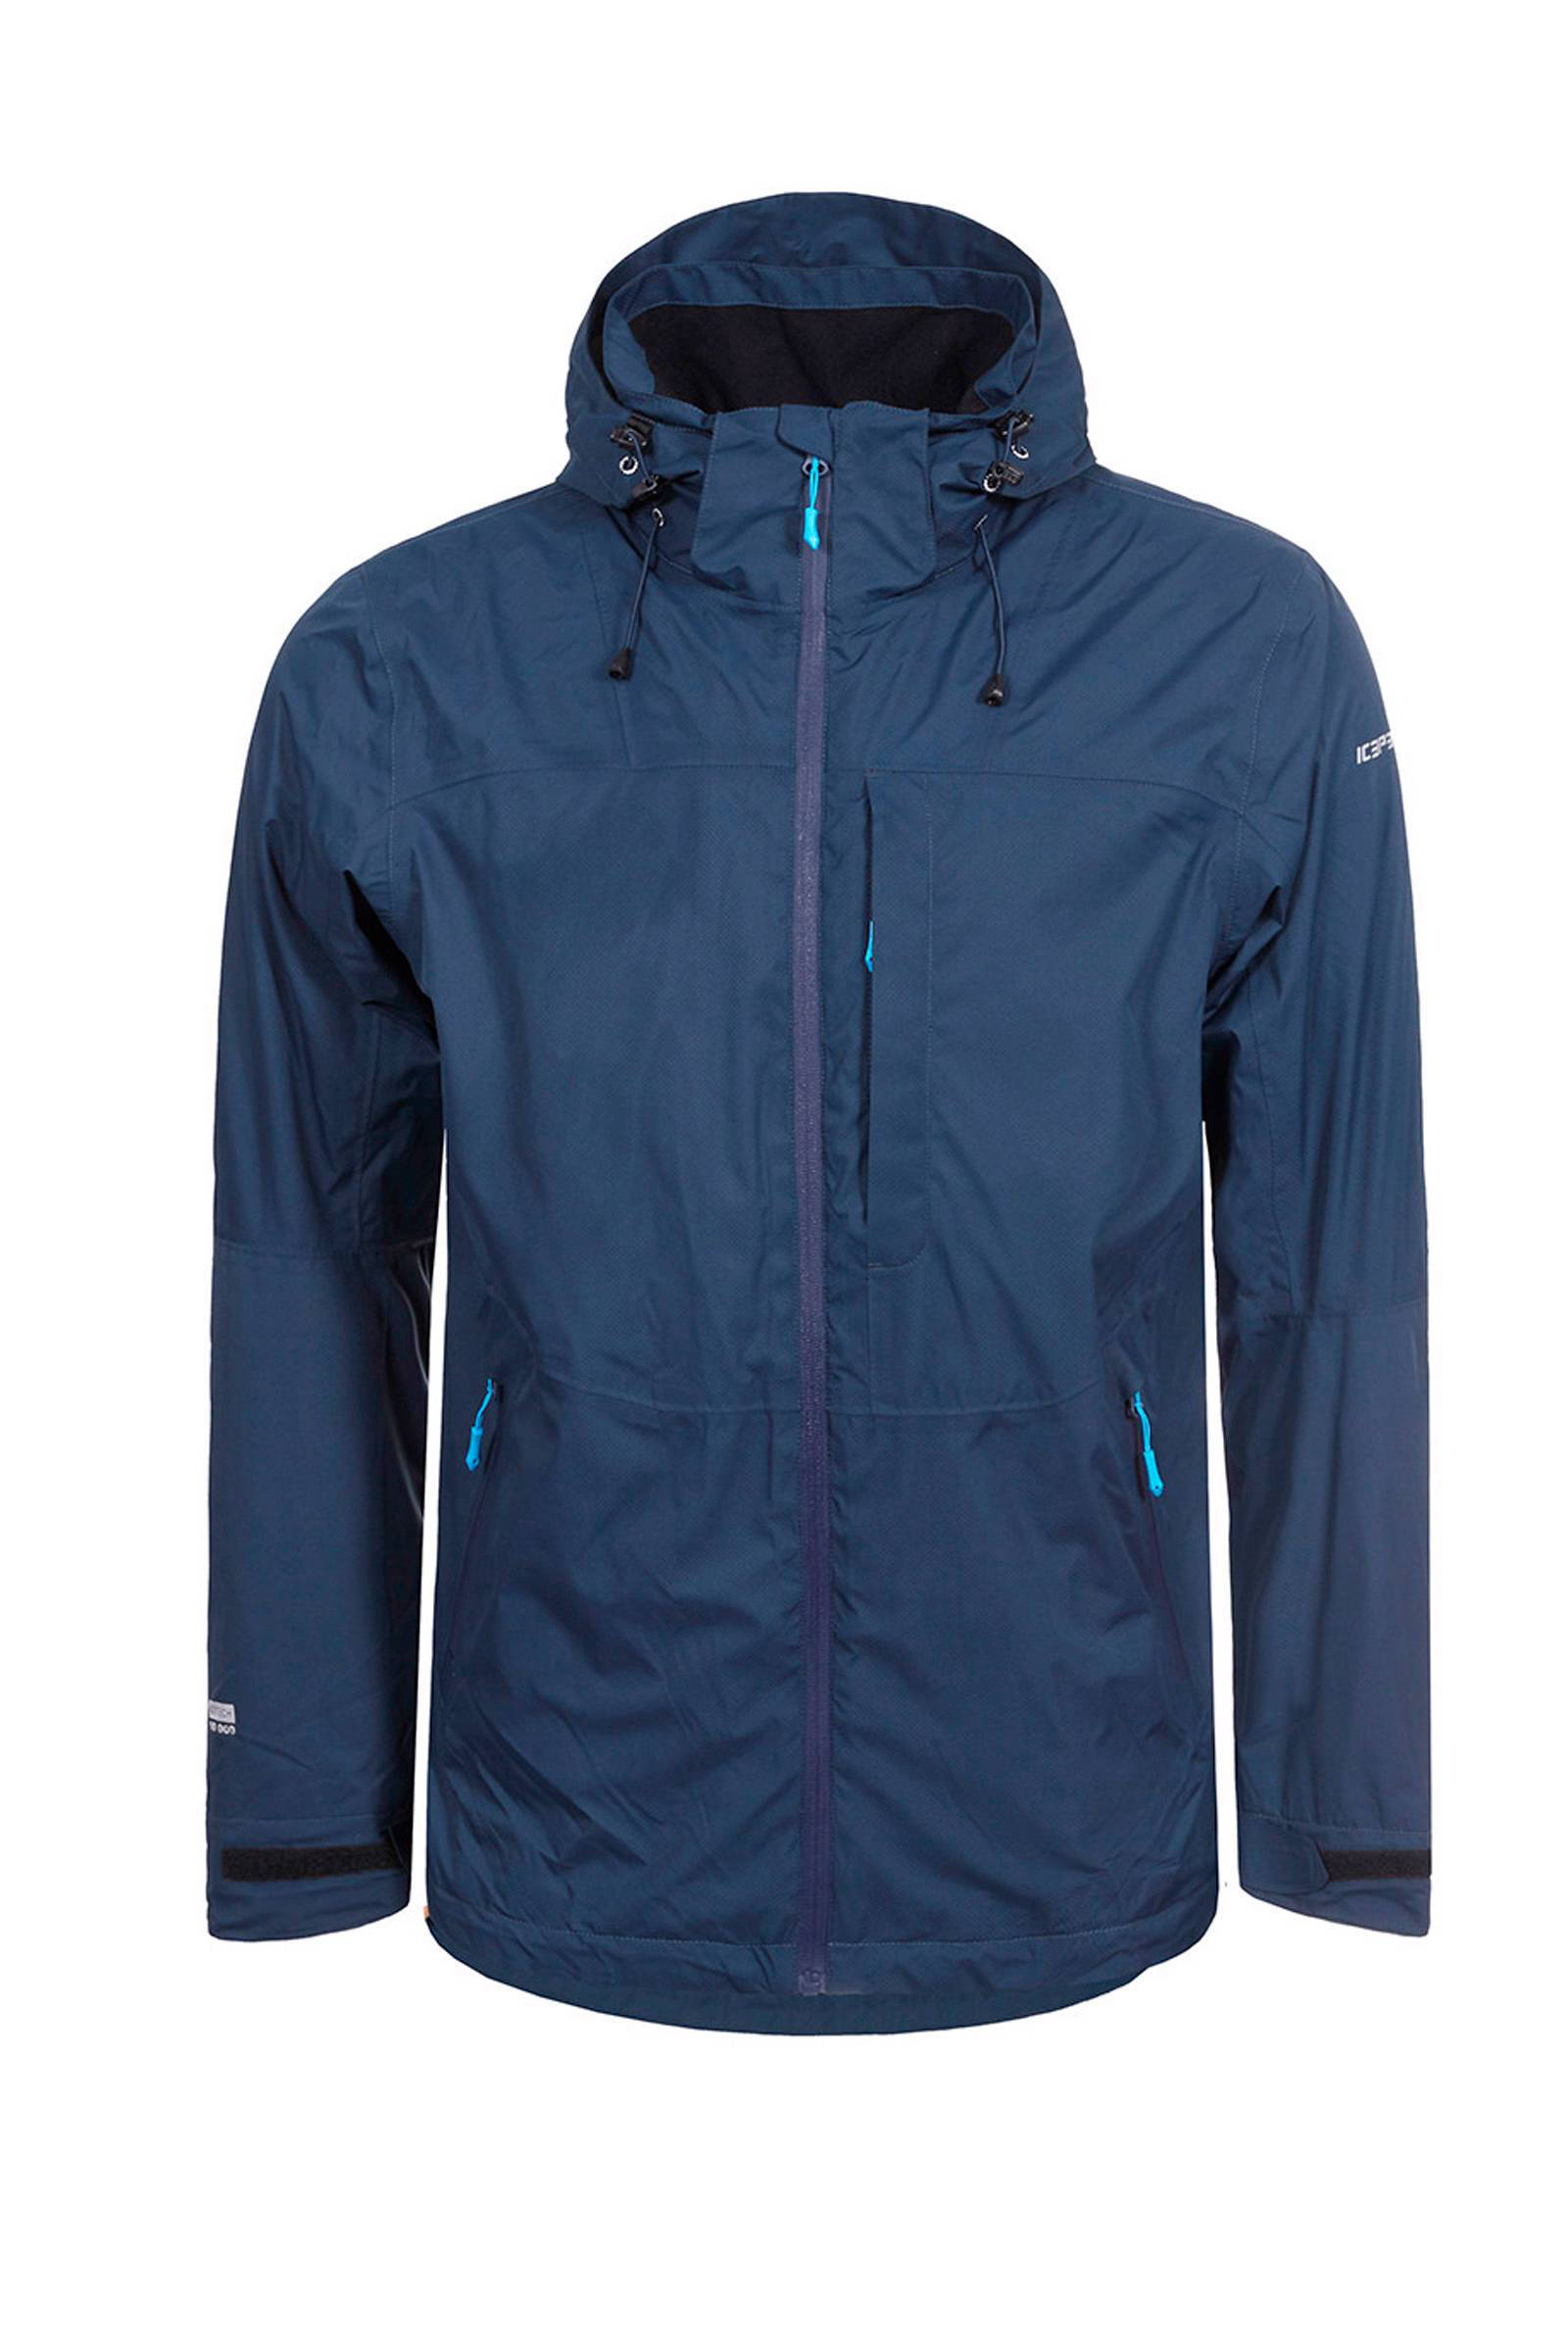 Sahar Icepeak jas donkerblauw outdoor hardshell C6wq48